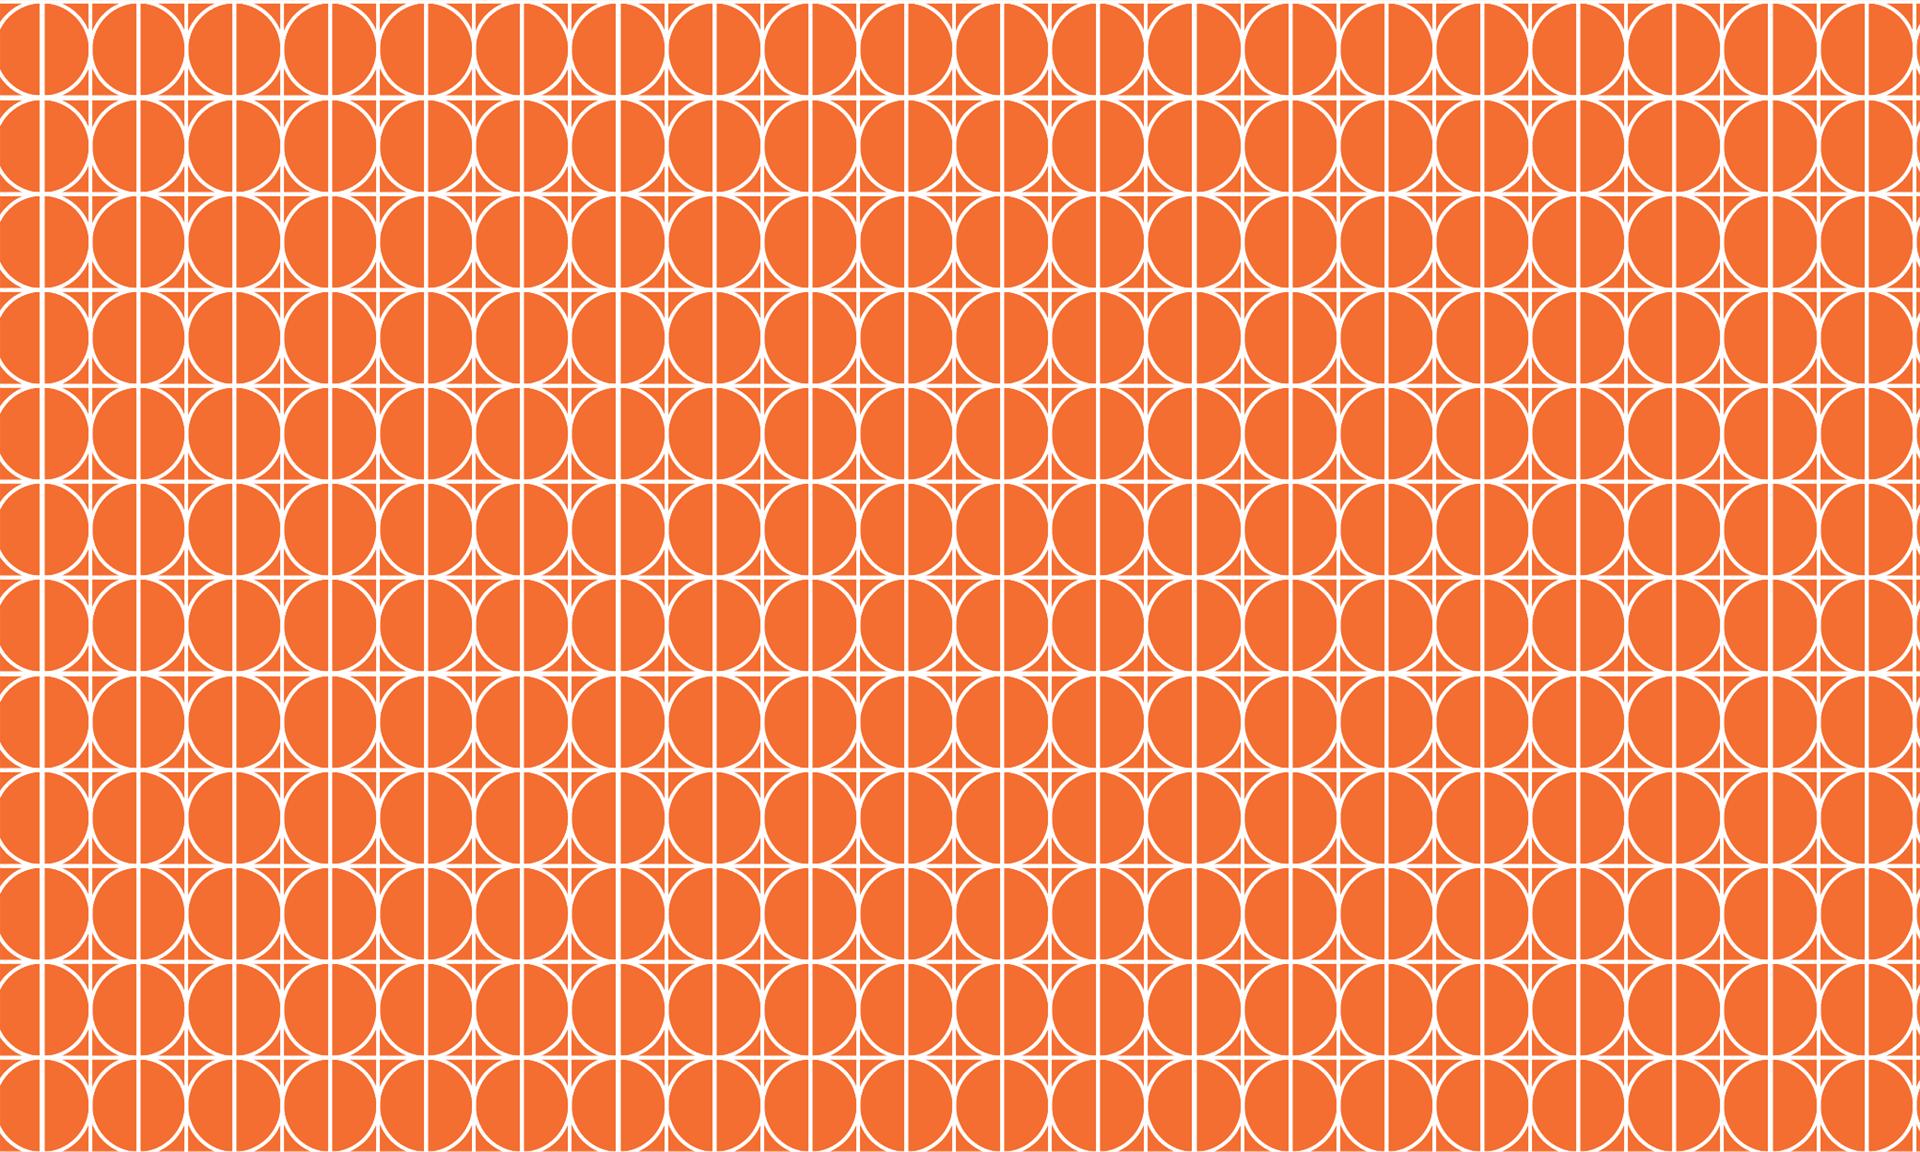 Creative Estuary brand architectural pattern 8